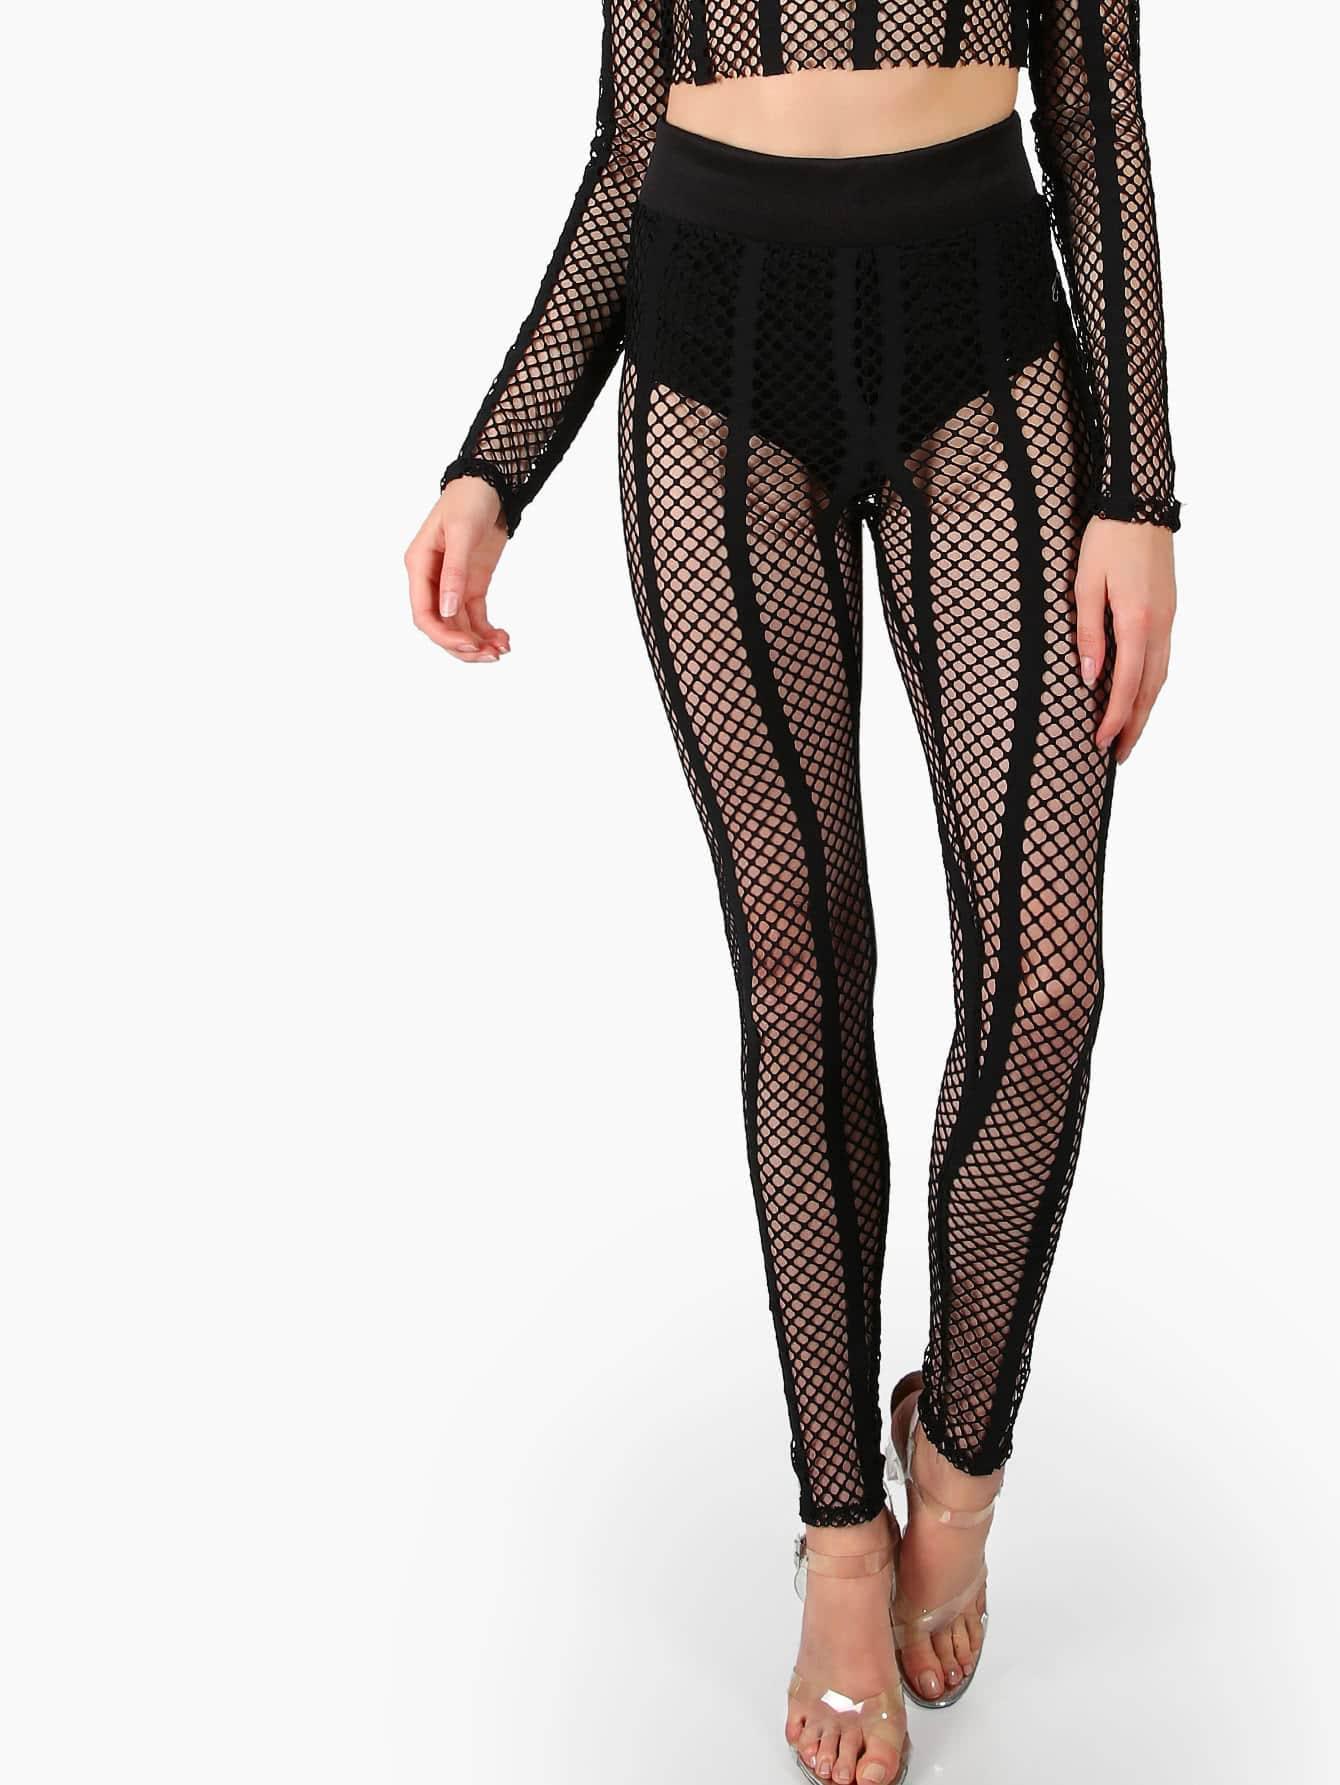 Striped Fishnet Leggings BLACK -SheIn(Sheinside)